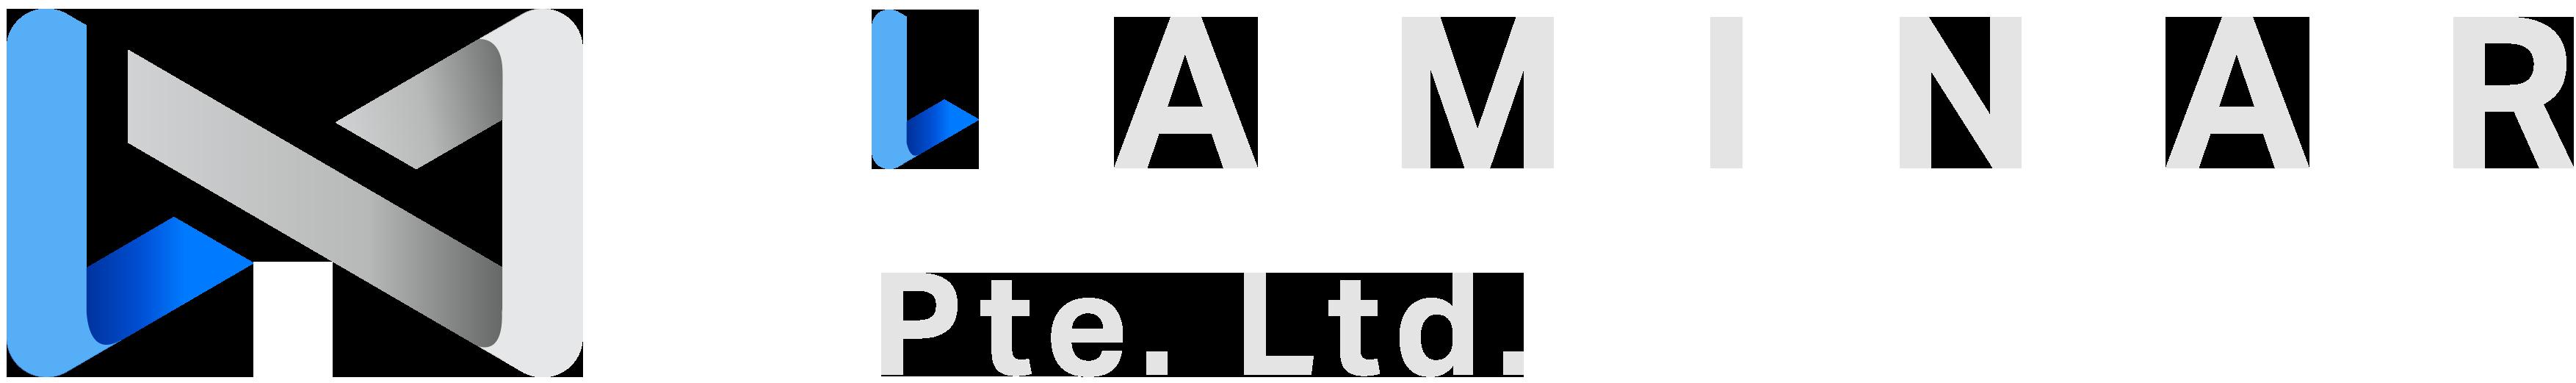 Laminar Pte. Ltd.